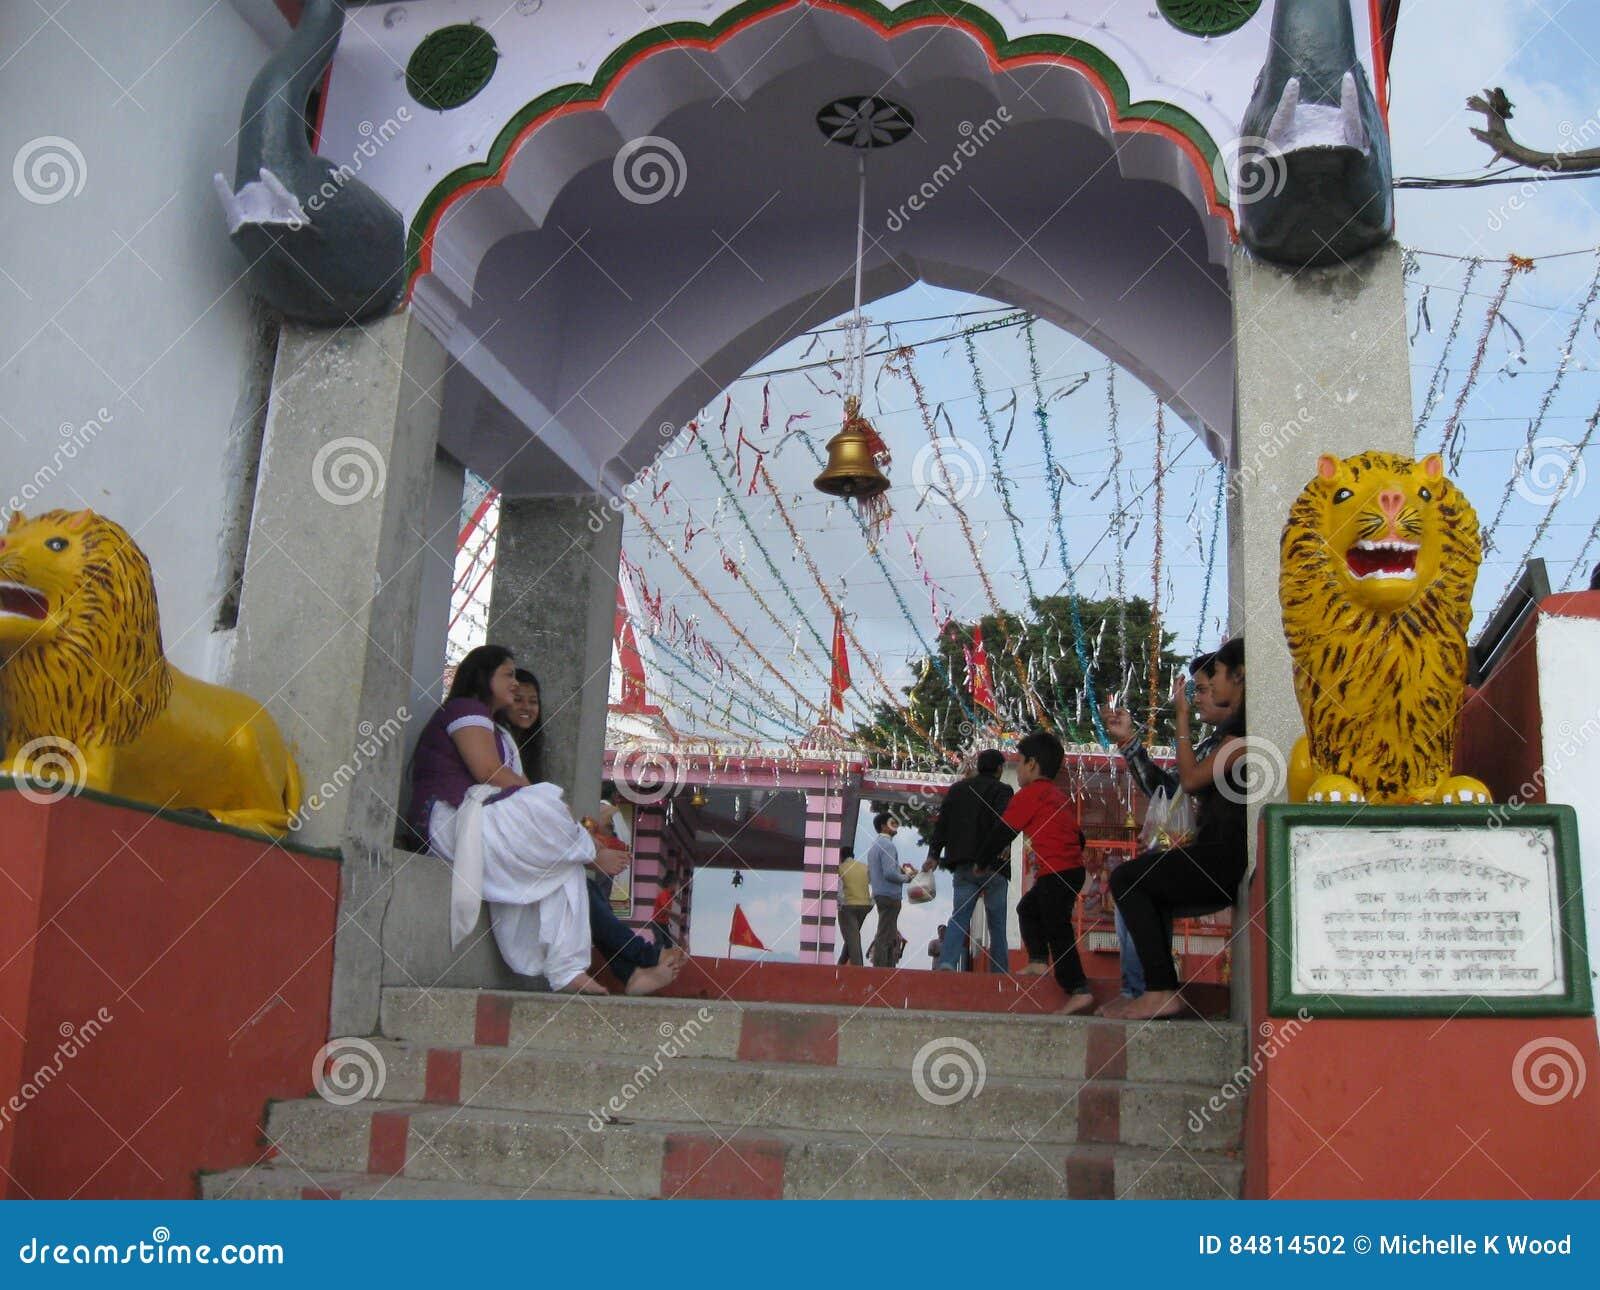 Kunjapuri Temple near Rishikesh India